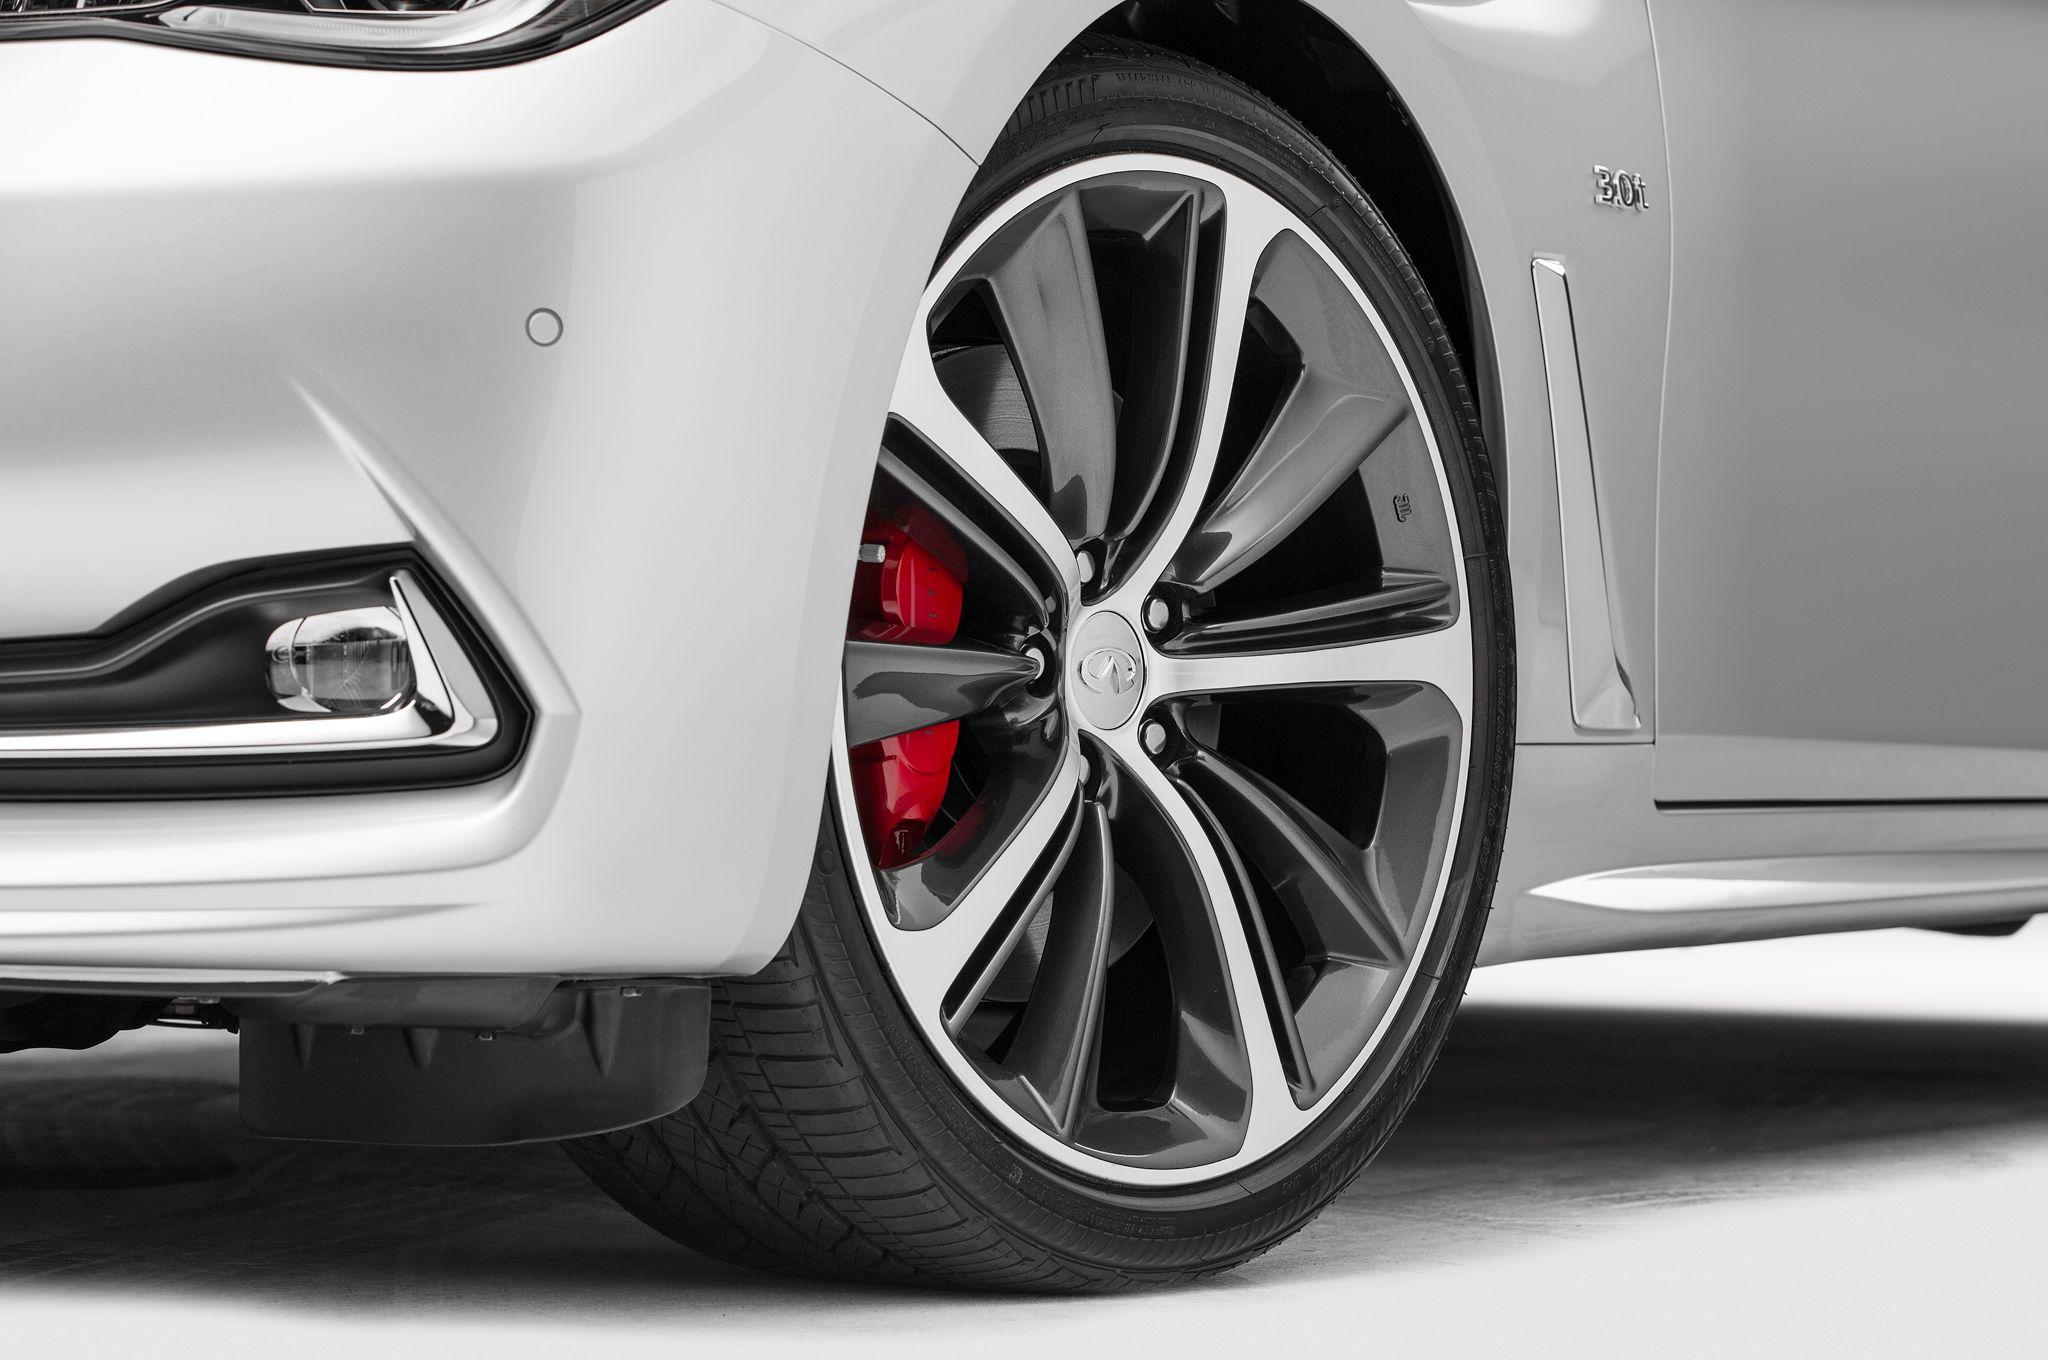 2017-Infiniti-Q60-Coupe-wheels.jpg (2048×1360) | Wheels | Pinterest